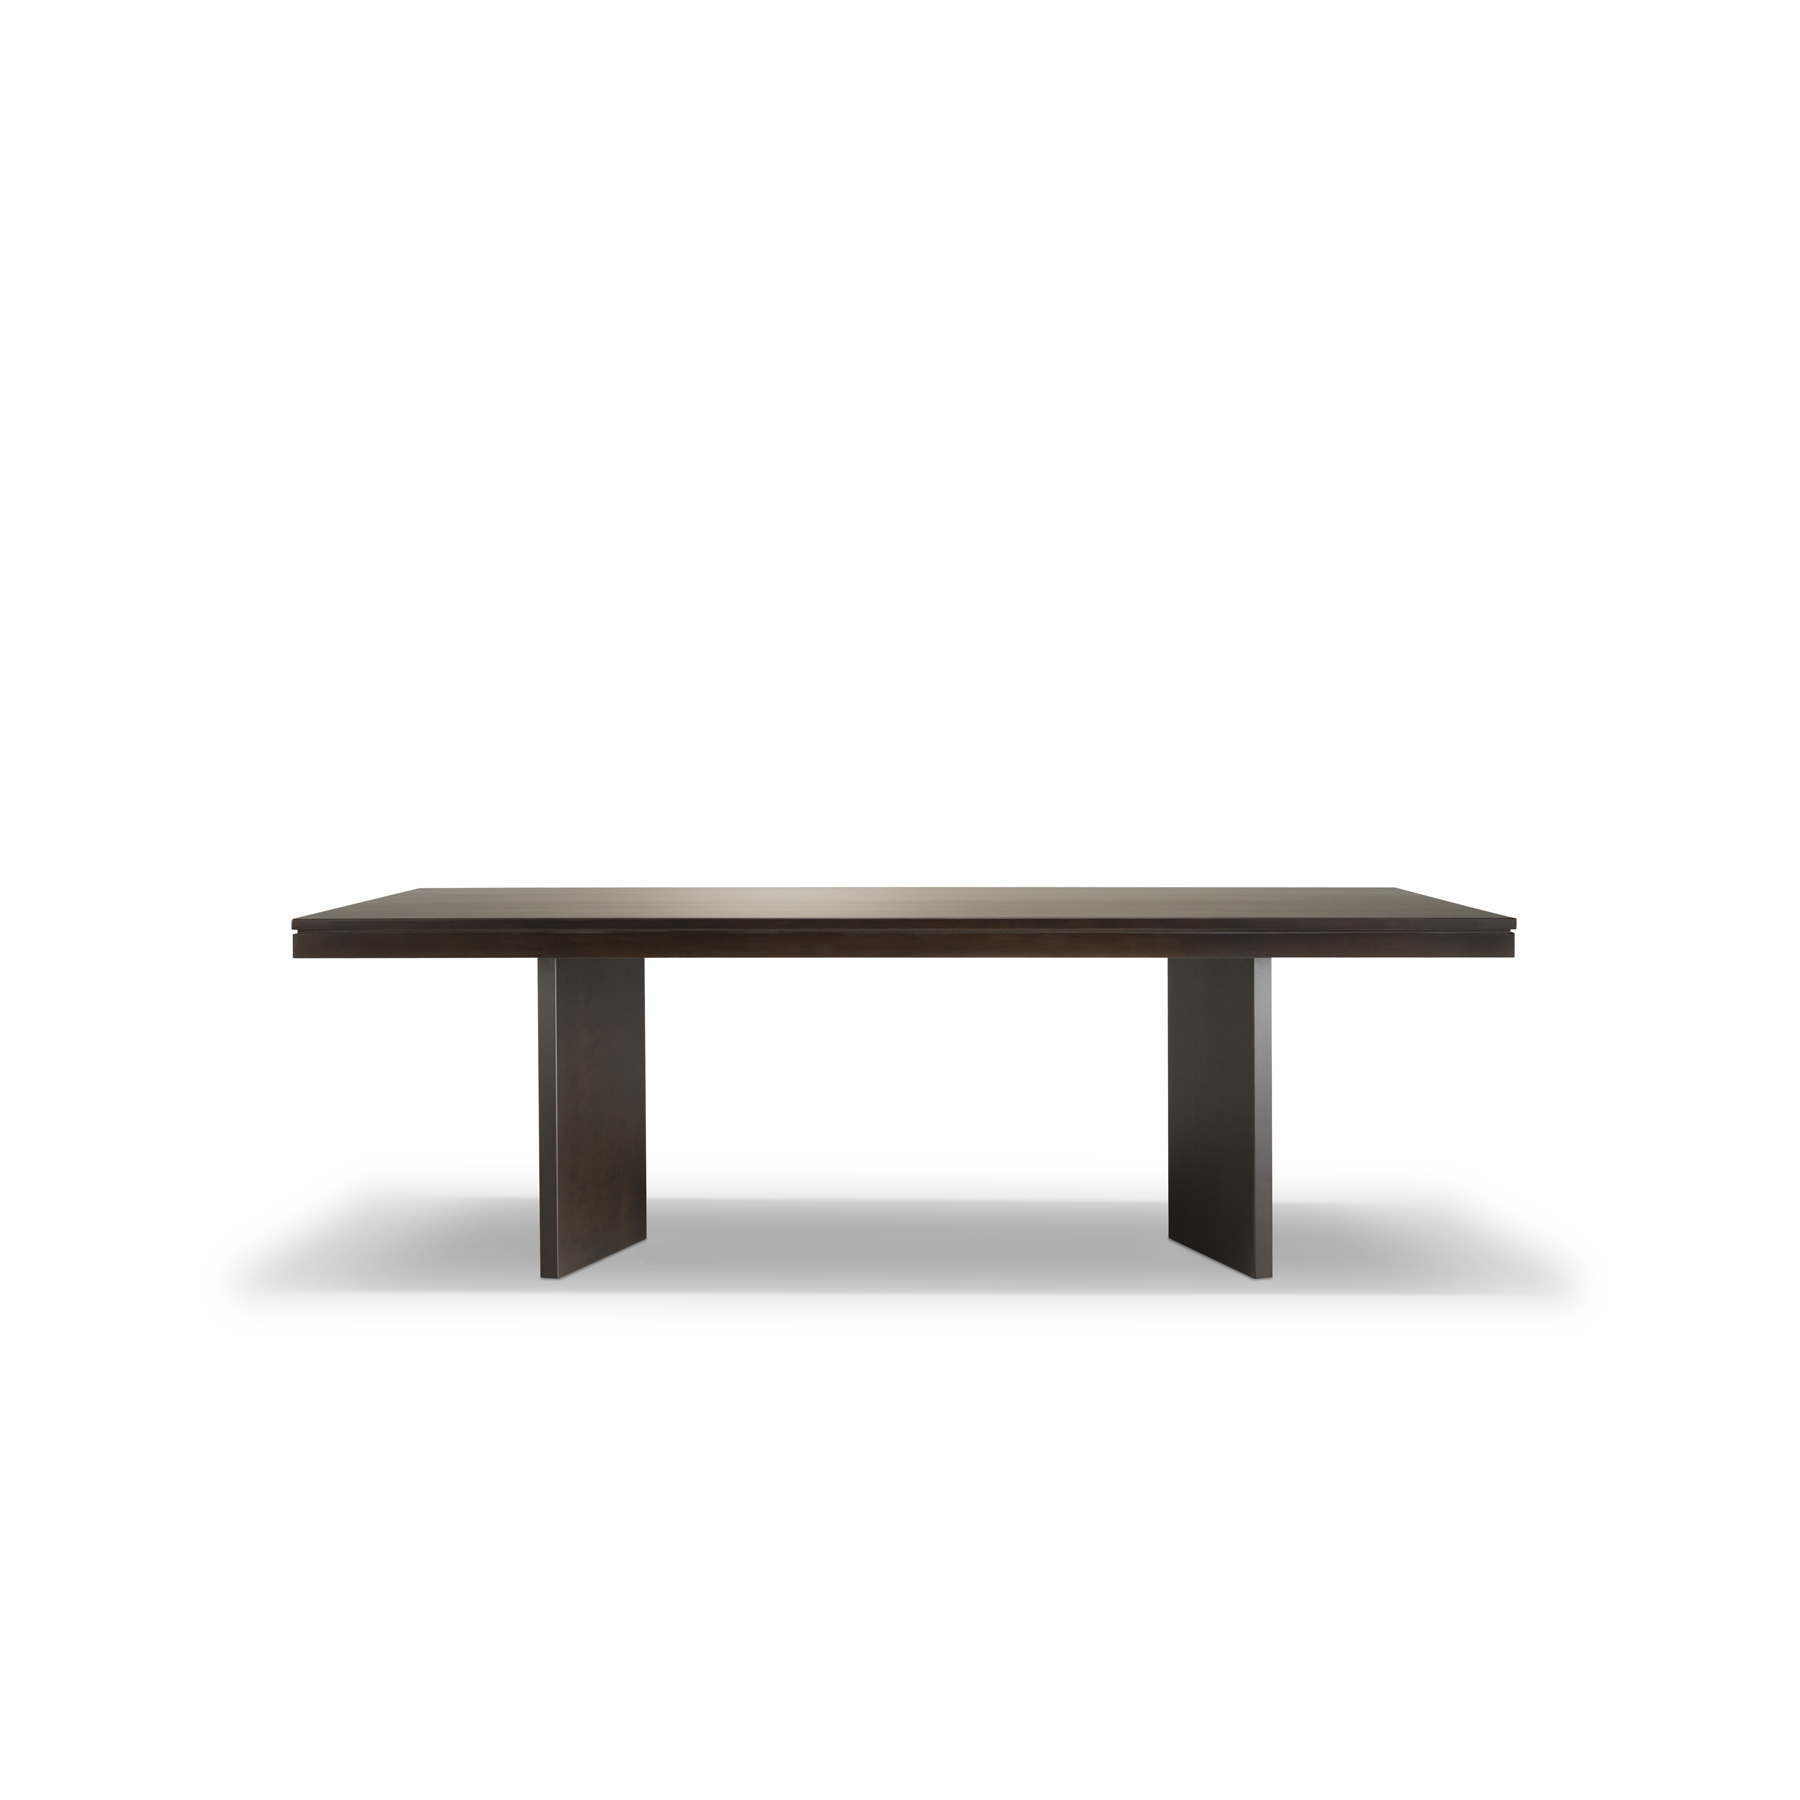 Arcadia-Table-D-PROOF-1-1-1.jpg